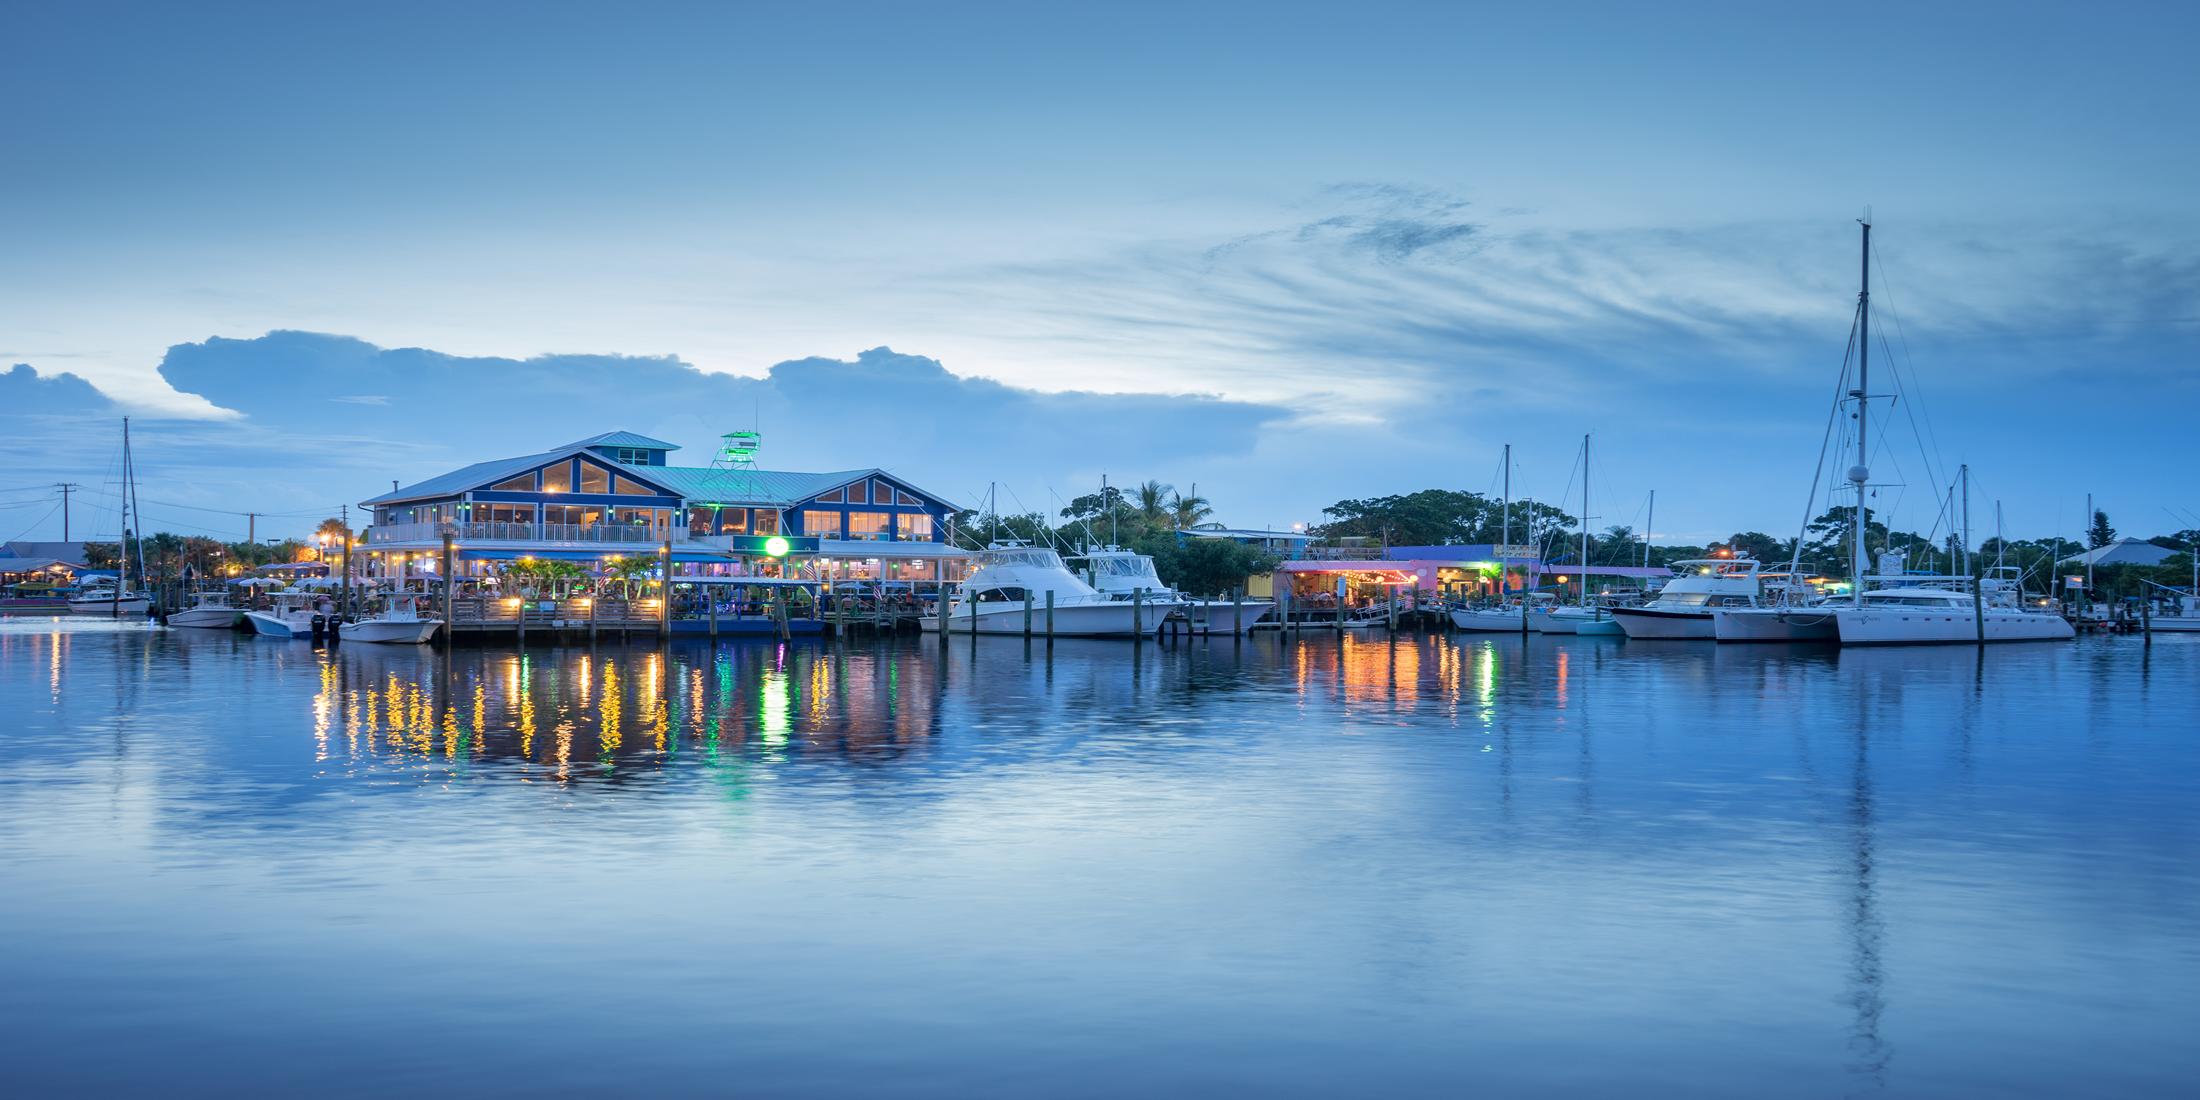 Stuart Waterfront Restaurants